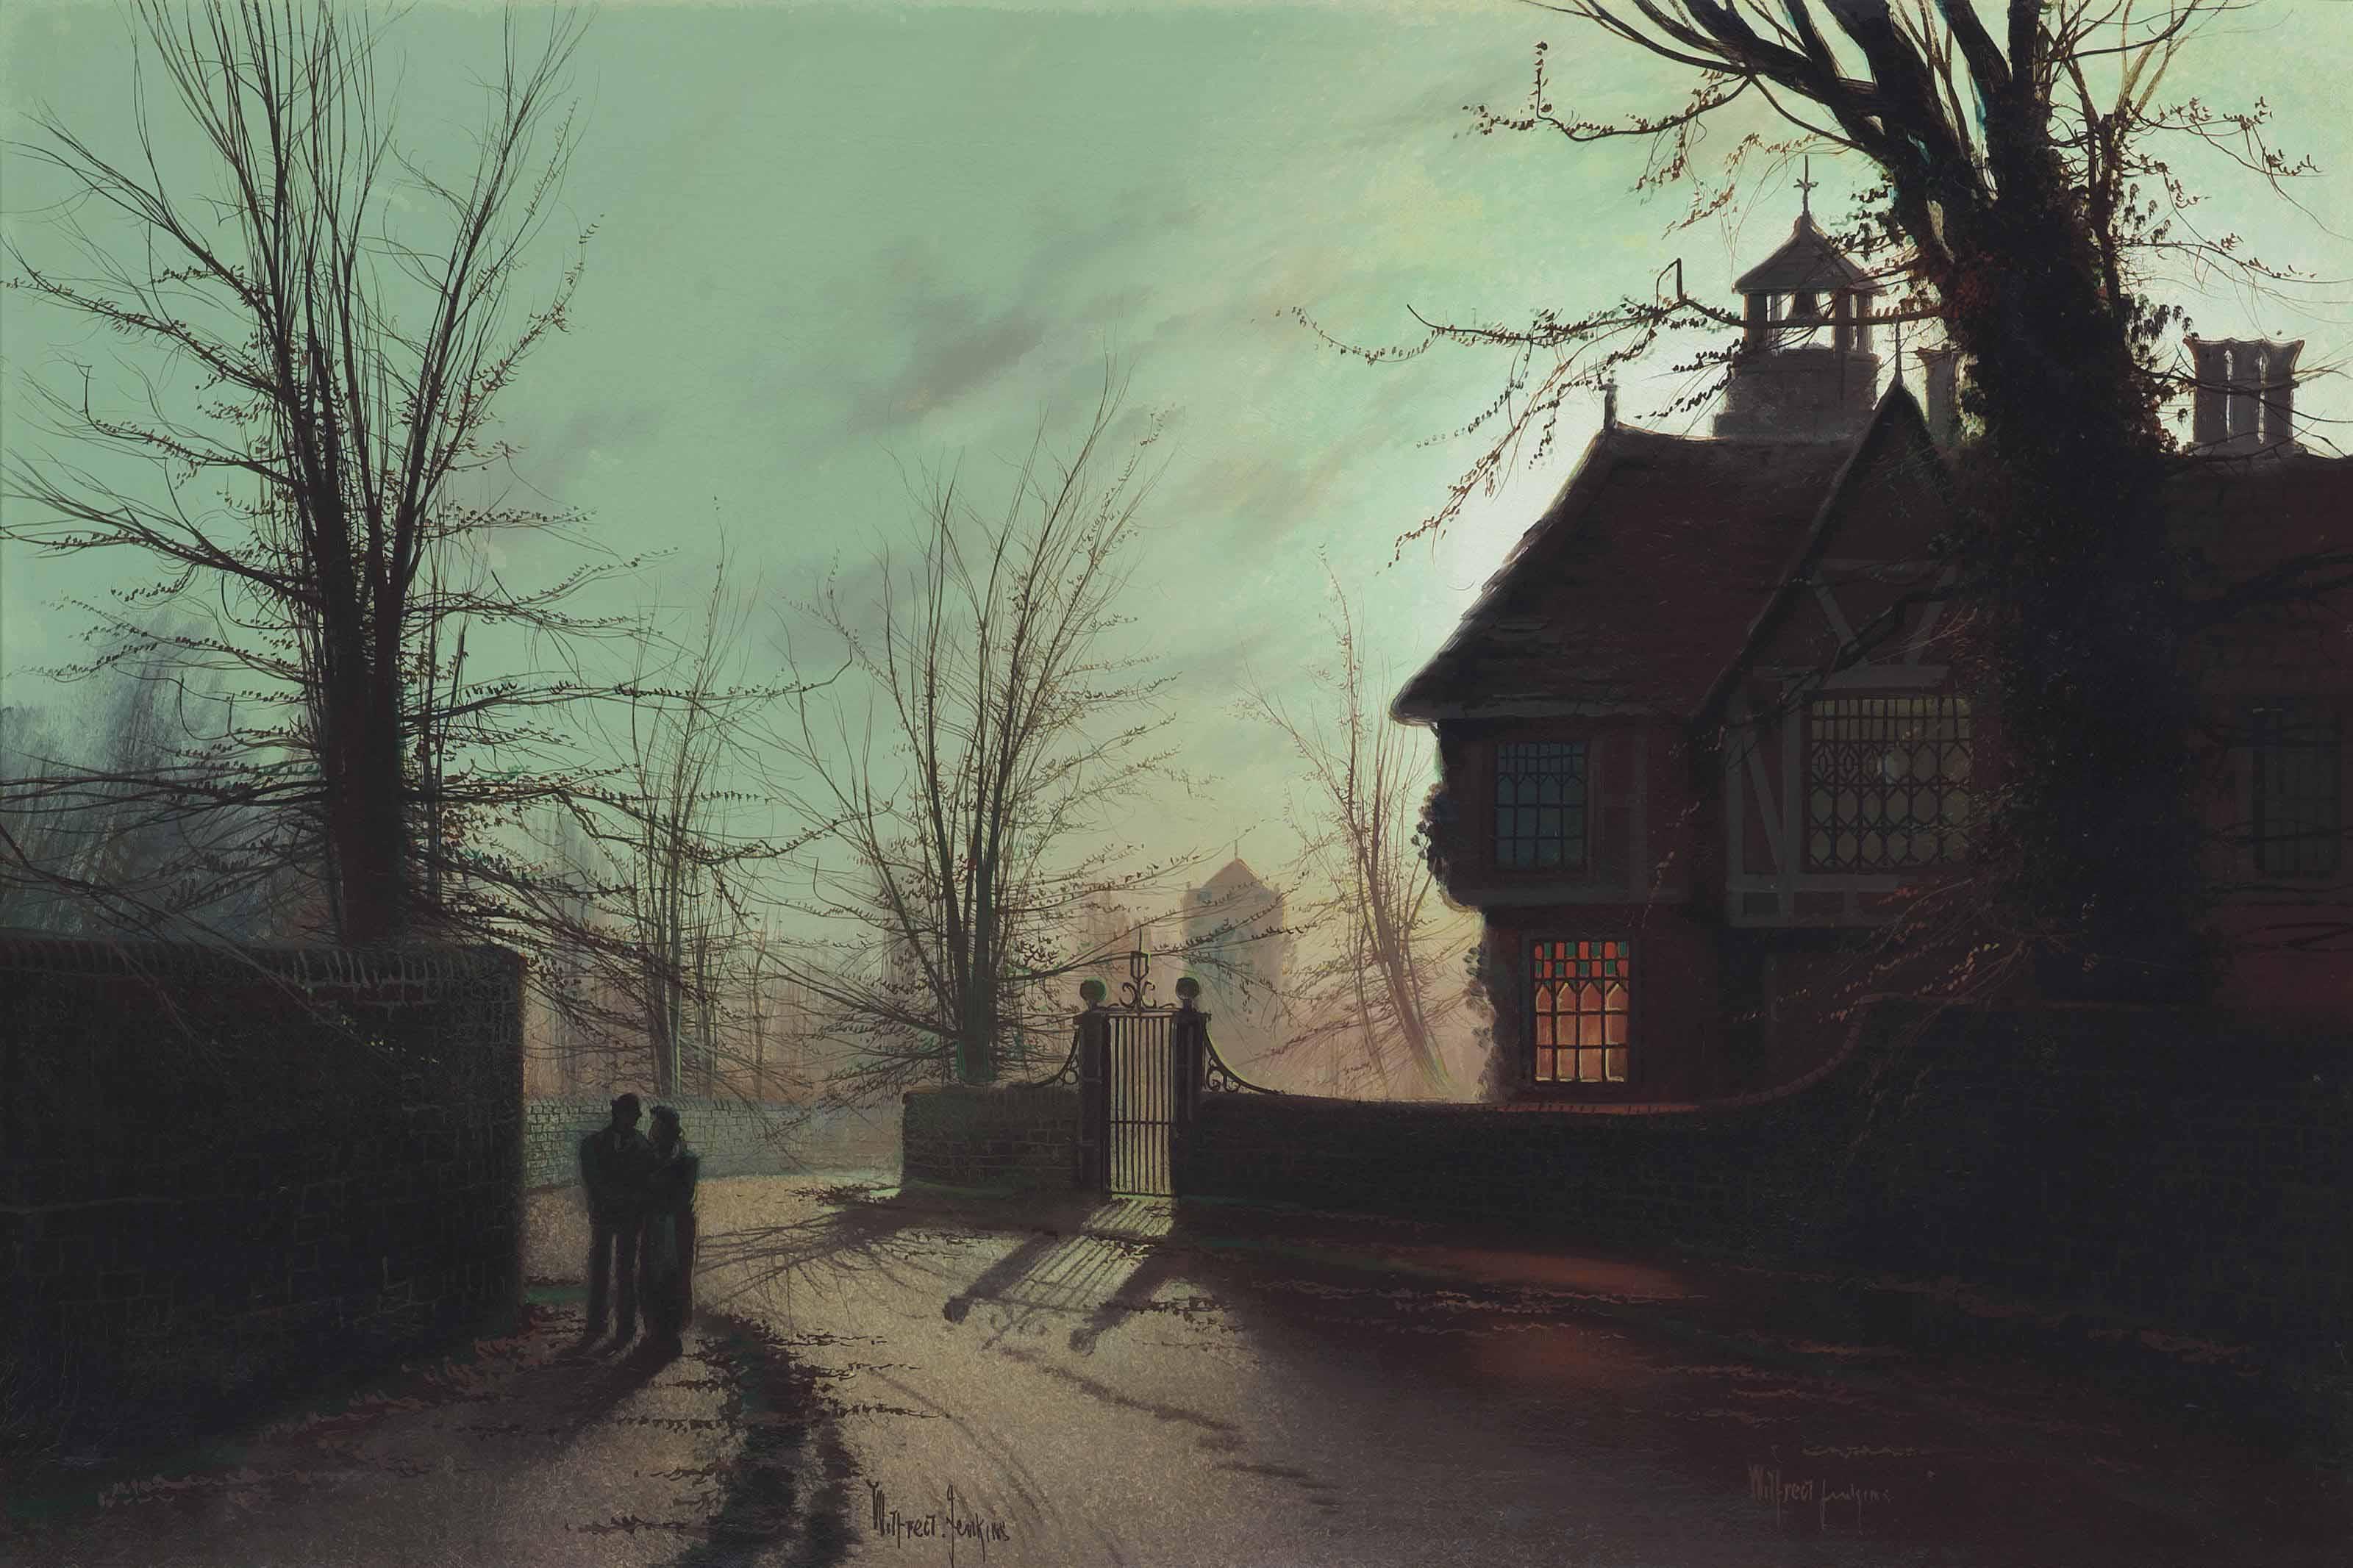 Lovers on a moonlit street